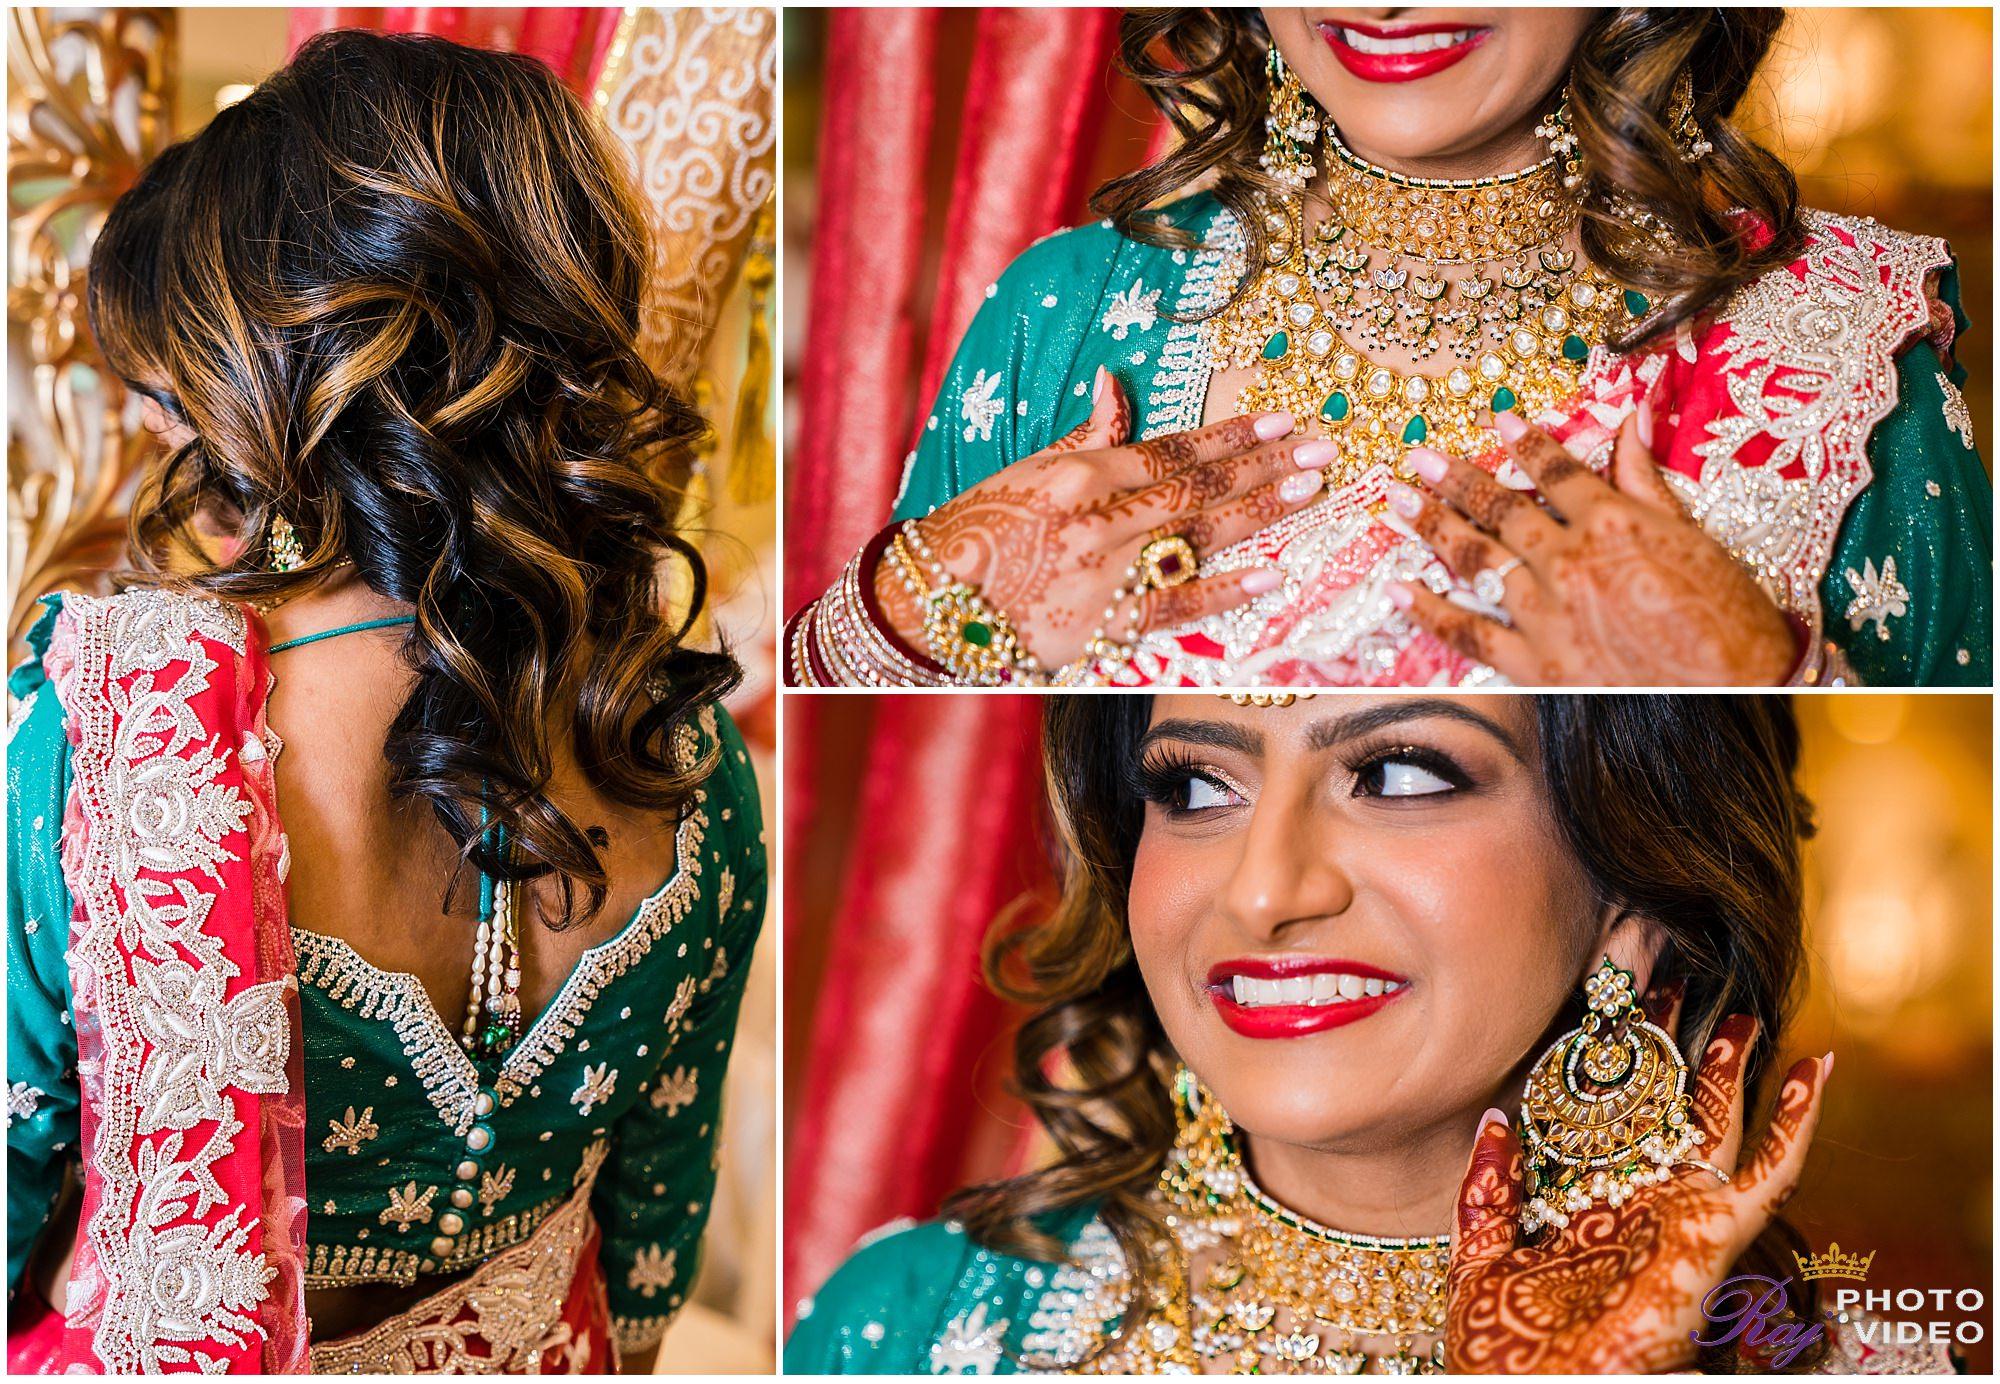 Sri-Guruvaayoorappan-Temple-Marlboro-NJ-Indian-Wedding-Chiyomi-Scott-00008.jpg